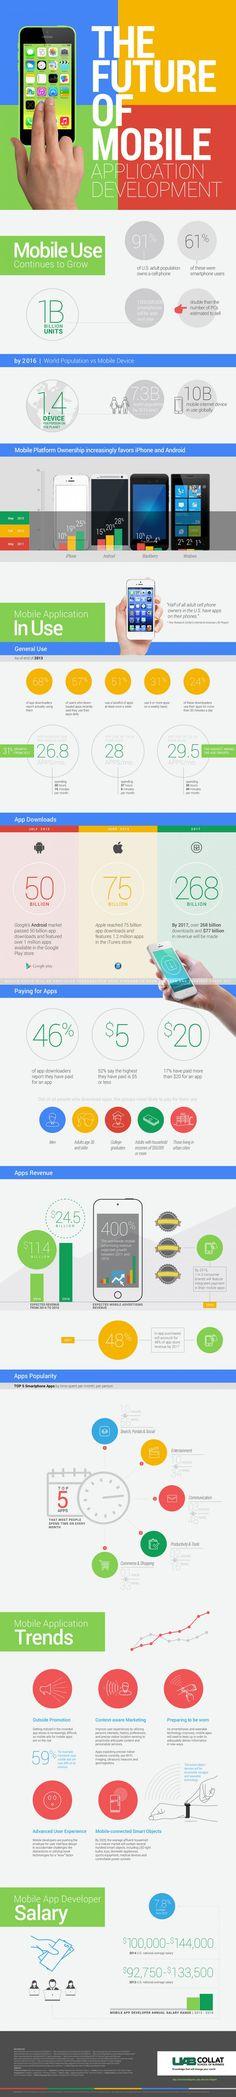 The future of mobile application development.